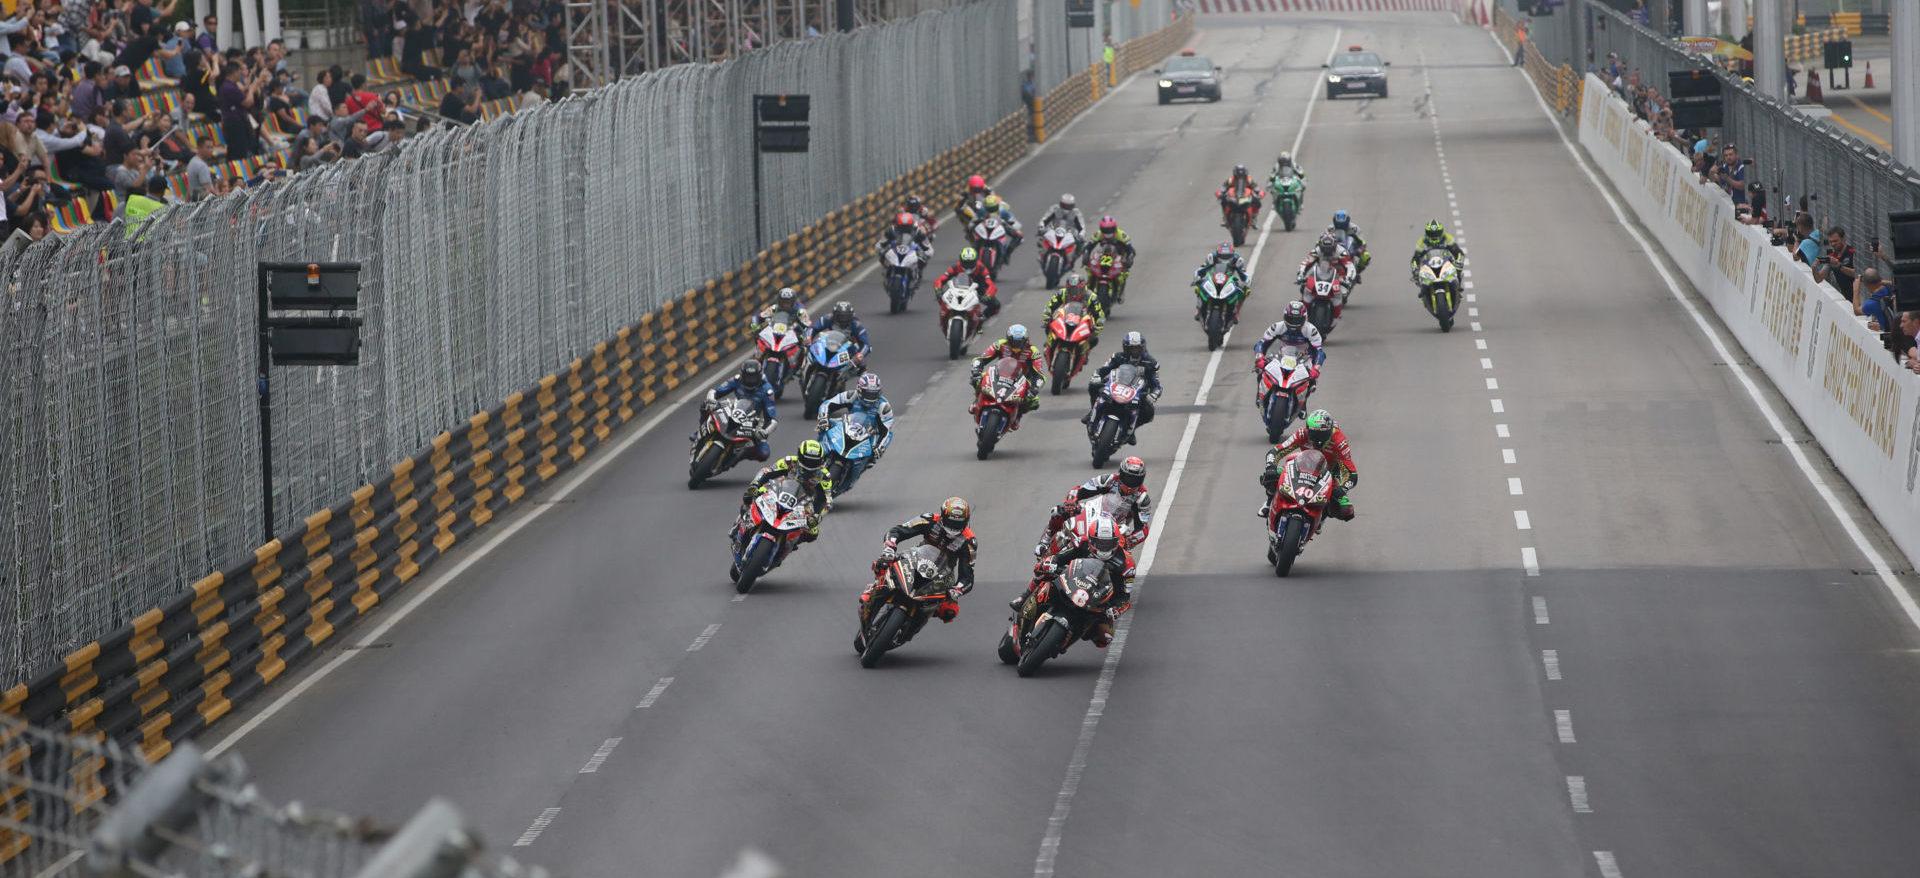 The start of the Macau Motorcycle Grand Prix in 2018. Photo courtesy Macau Grand Prix Committee.